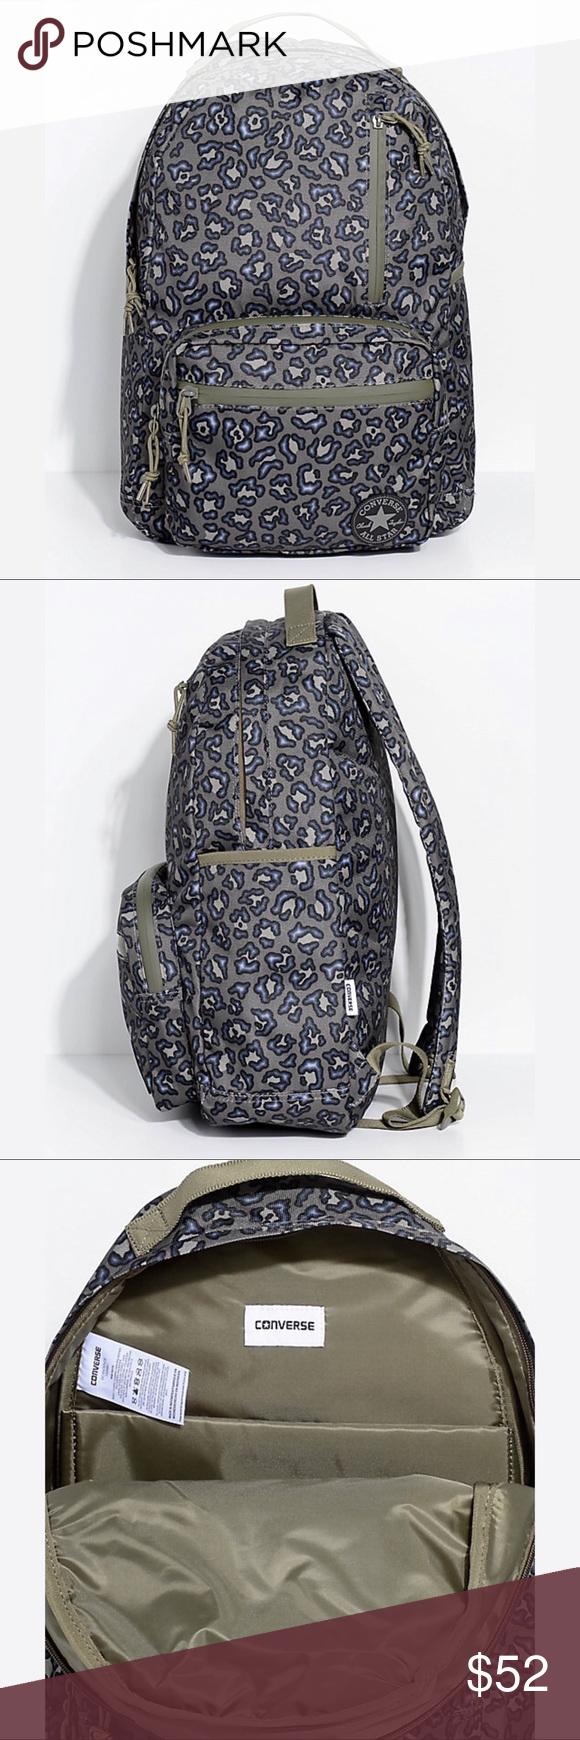 Converse Go Pack Olive Leopard Print Backpack Olive Green